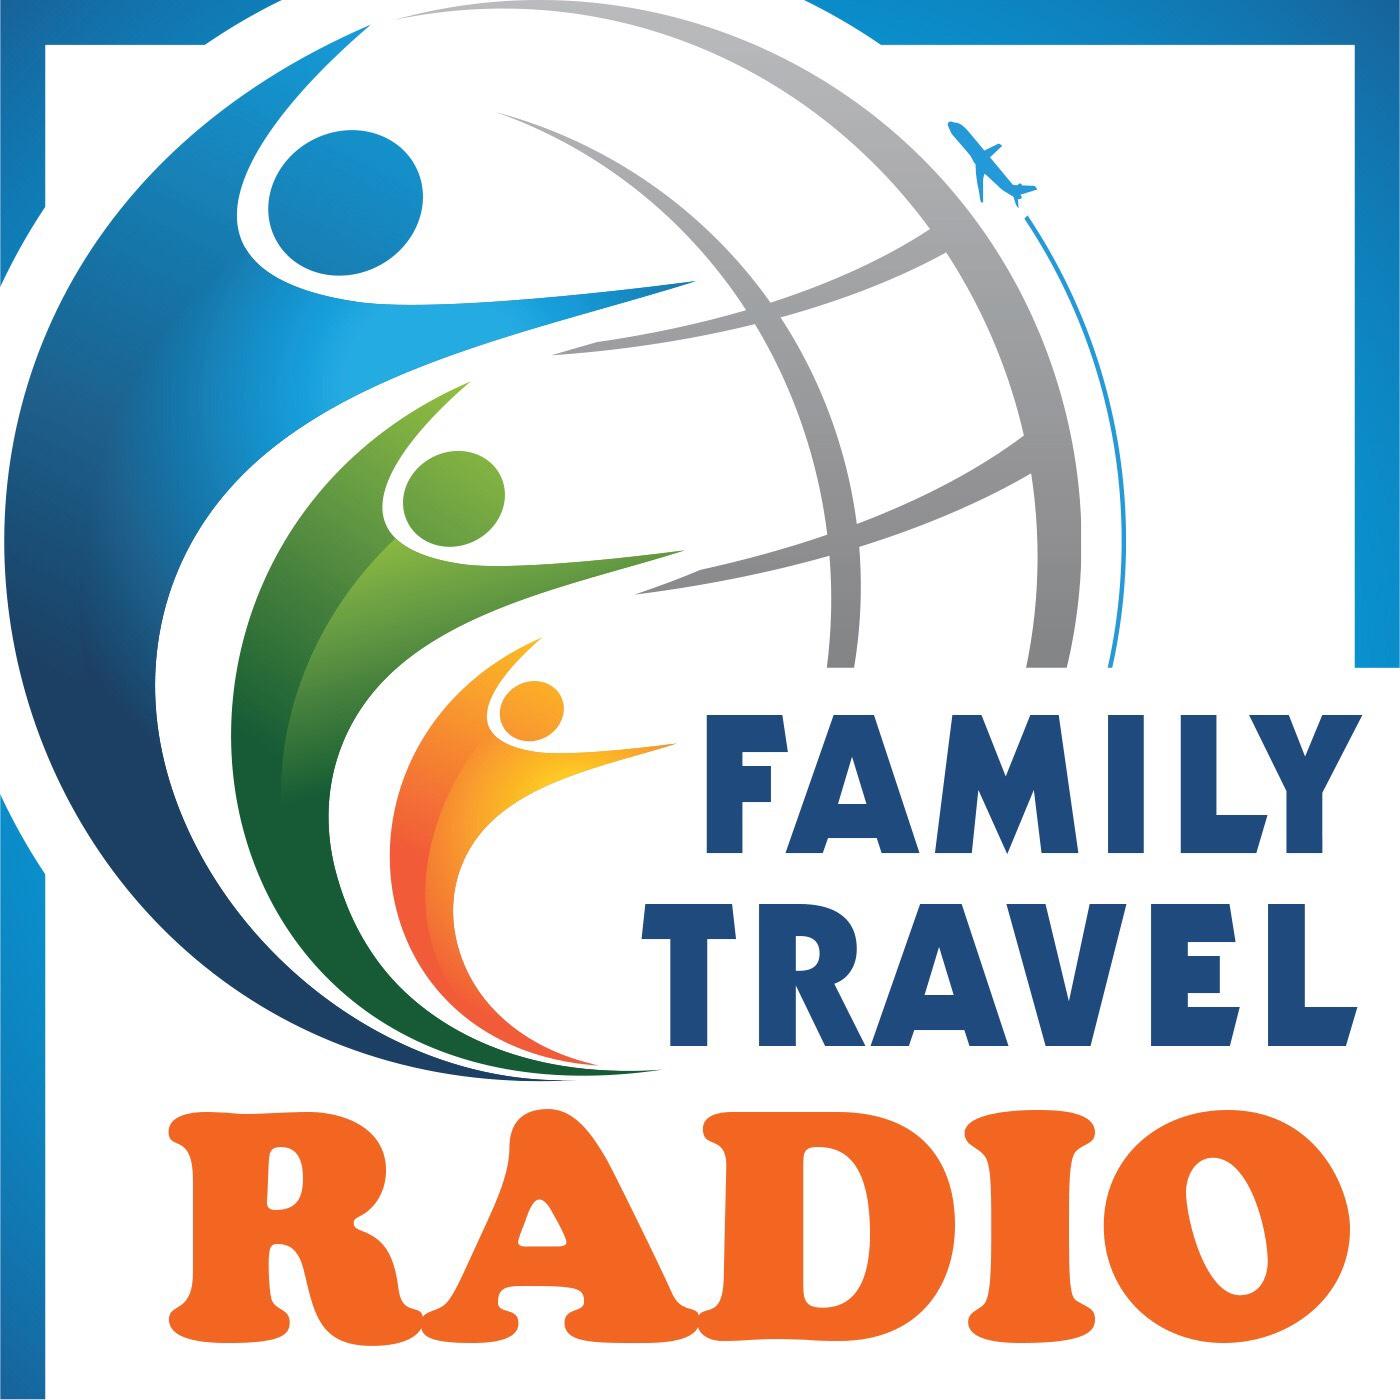 Family Travel Radio.jpg